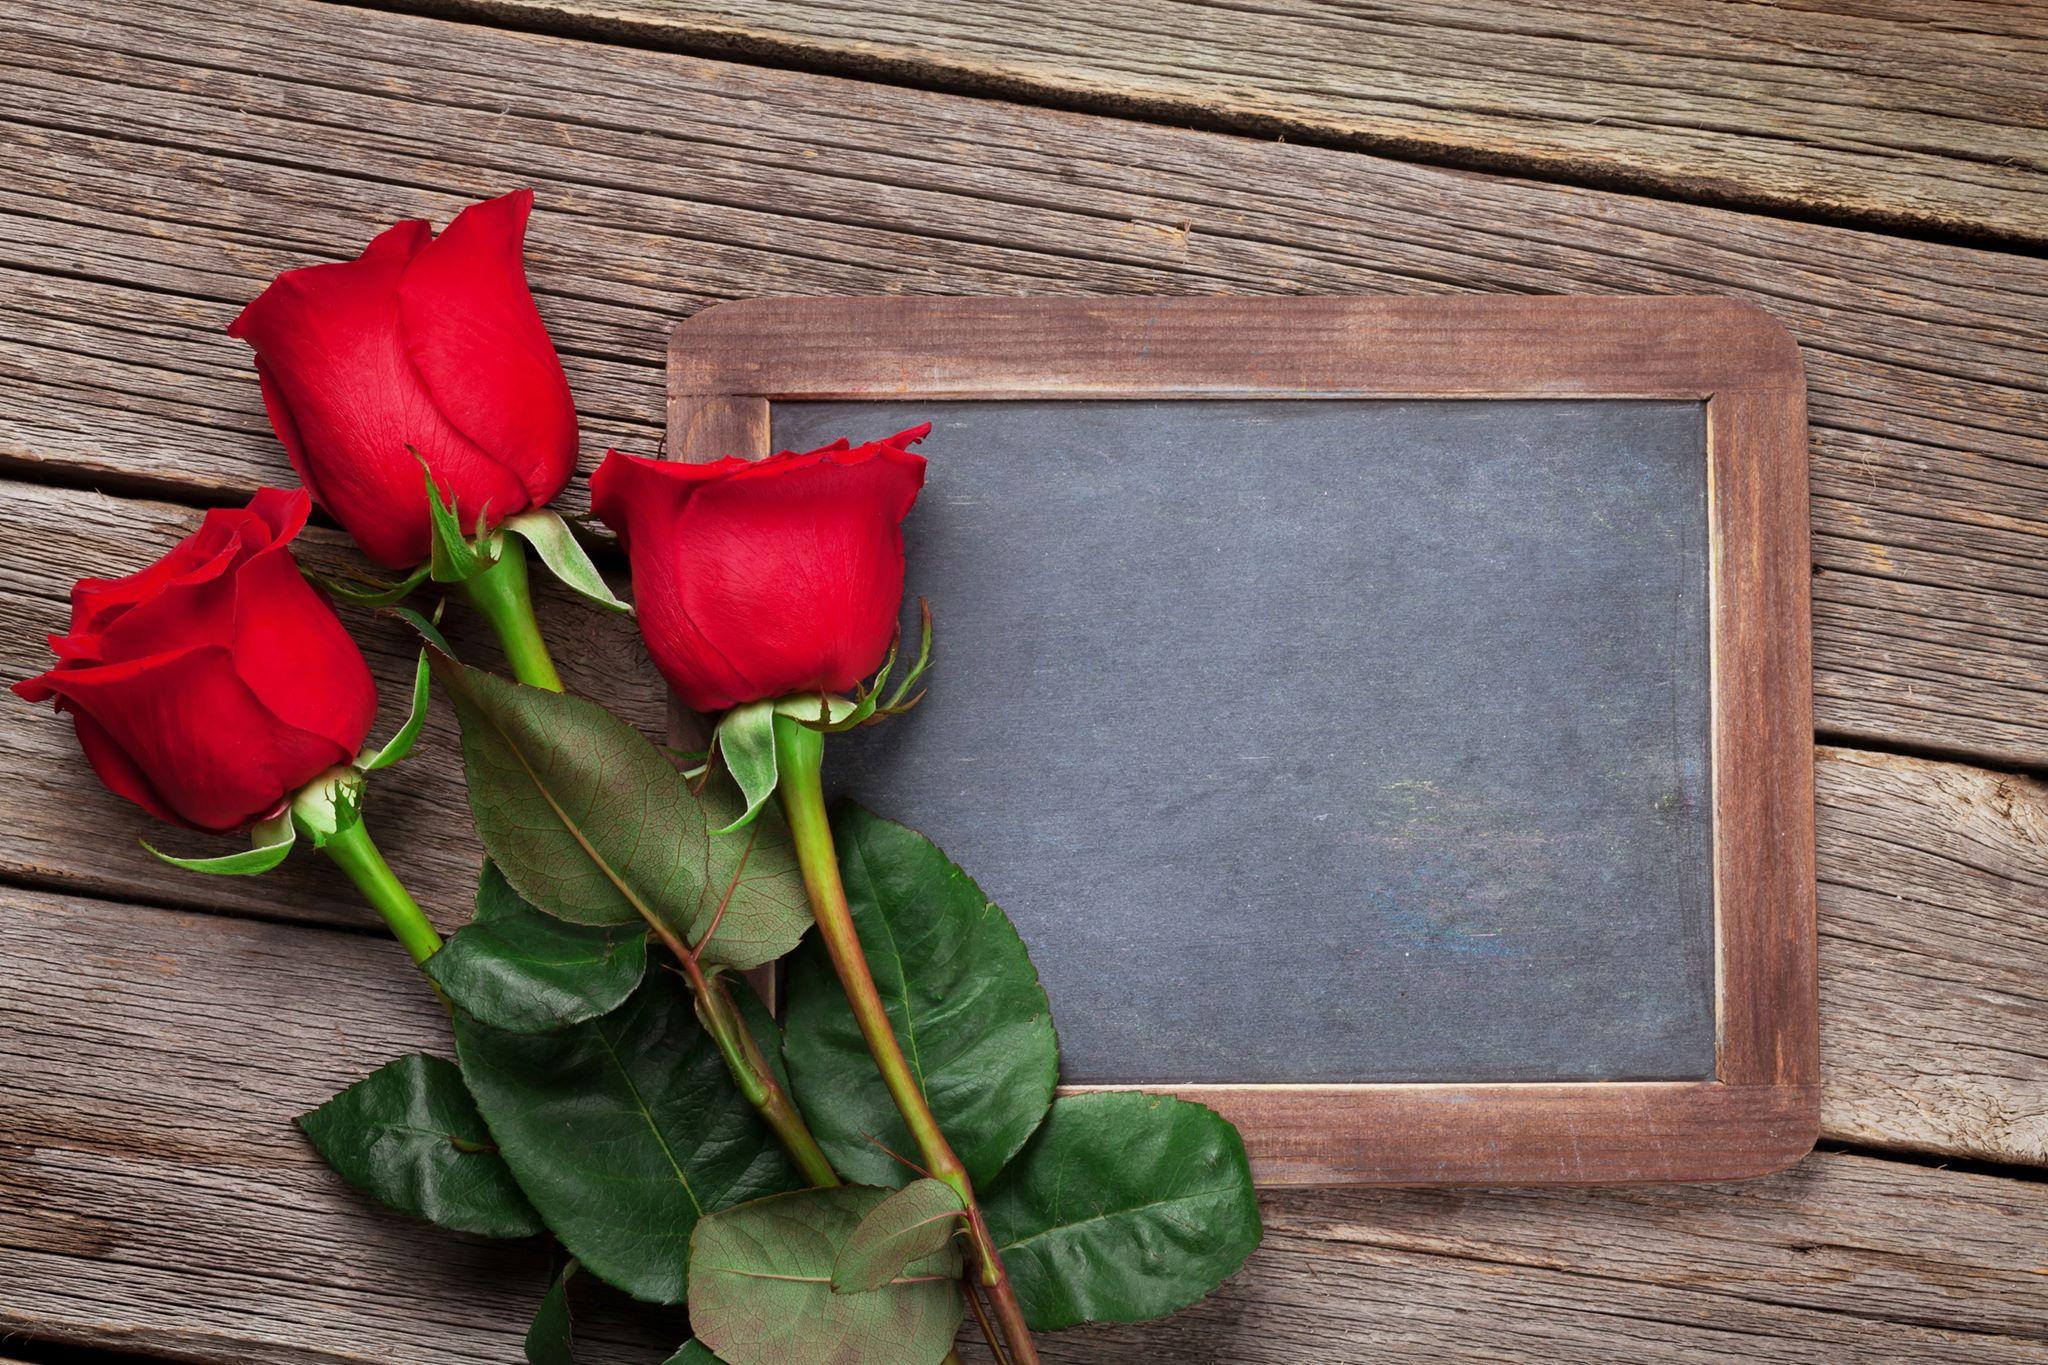 Valentines day images 1 صور عيد الحب